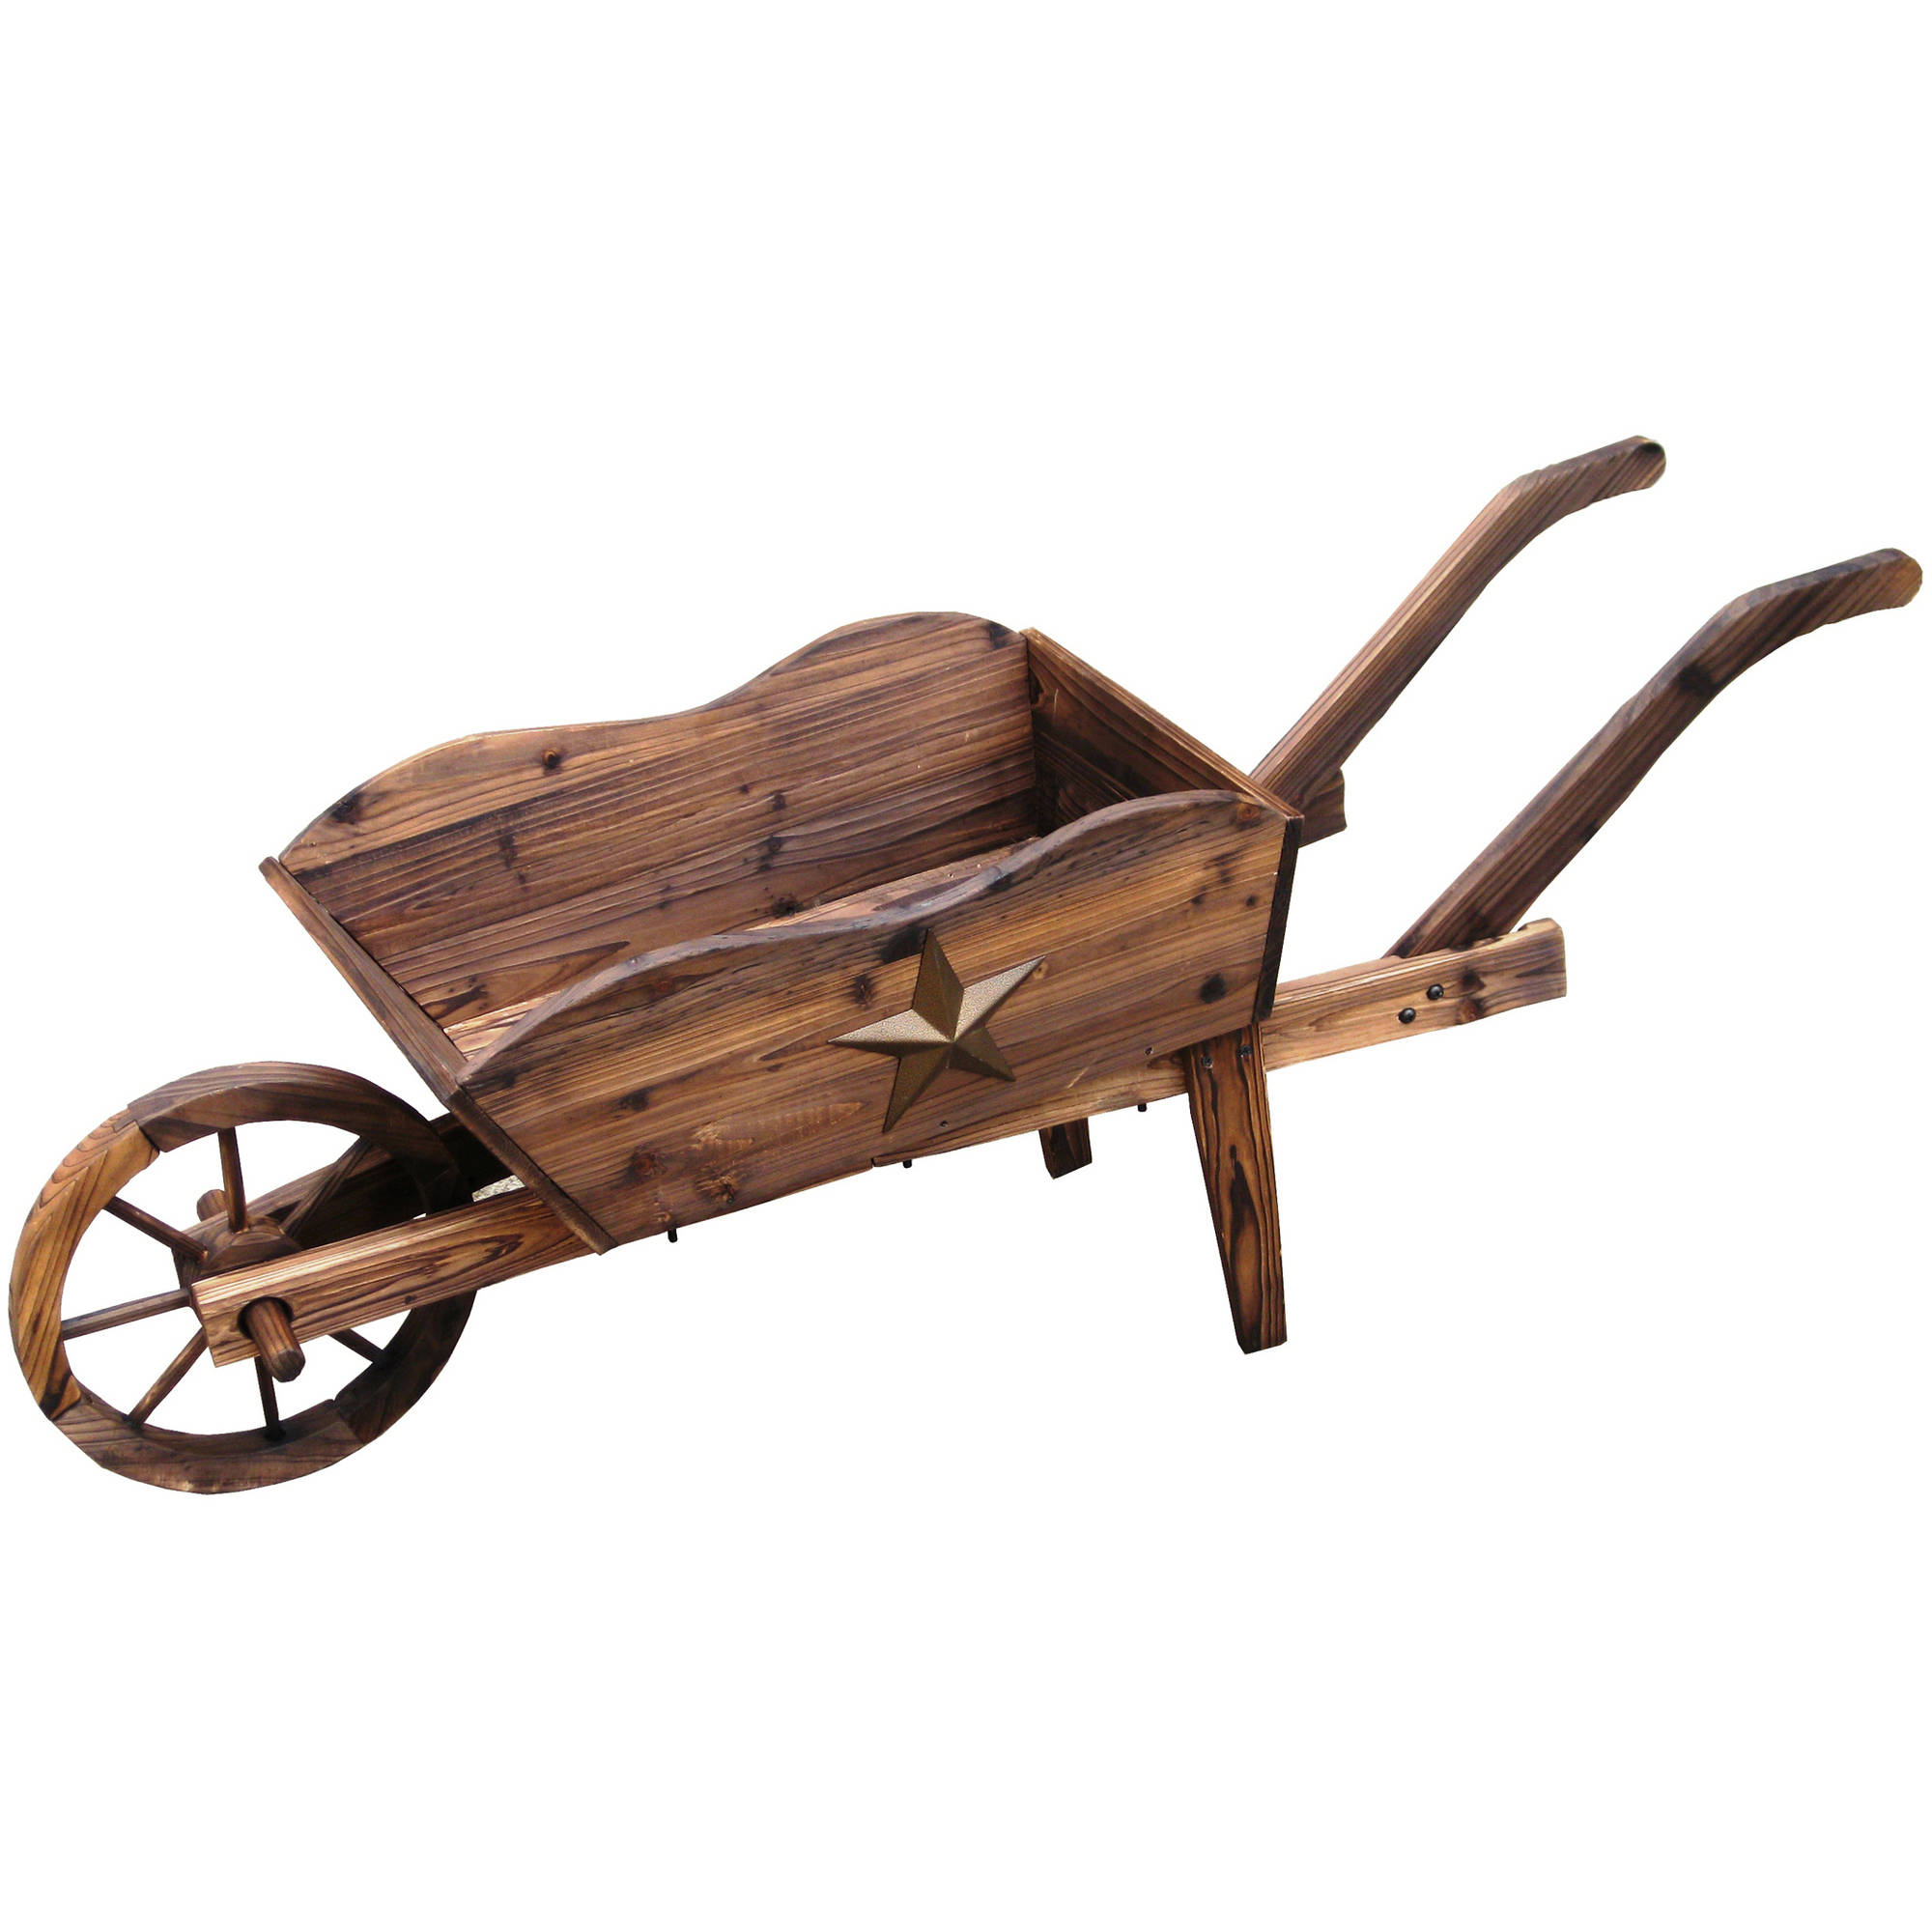 "Lehigh Country TX93959 24' L x 9""W x 16""H Wooden Wheel Barrow Planter"